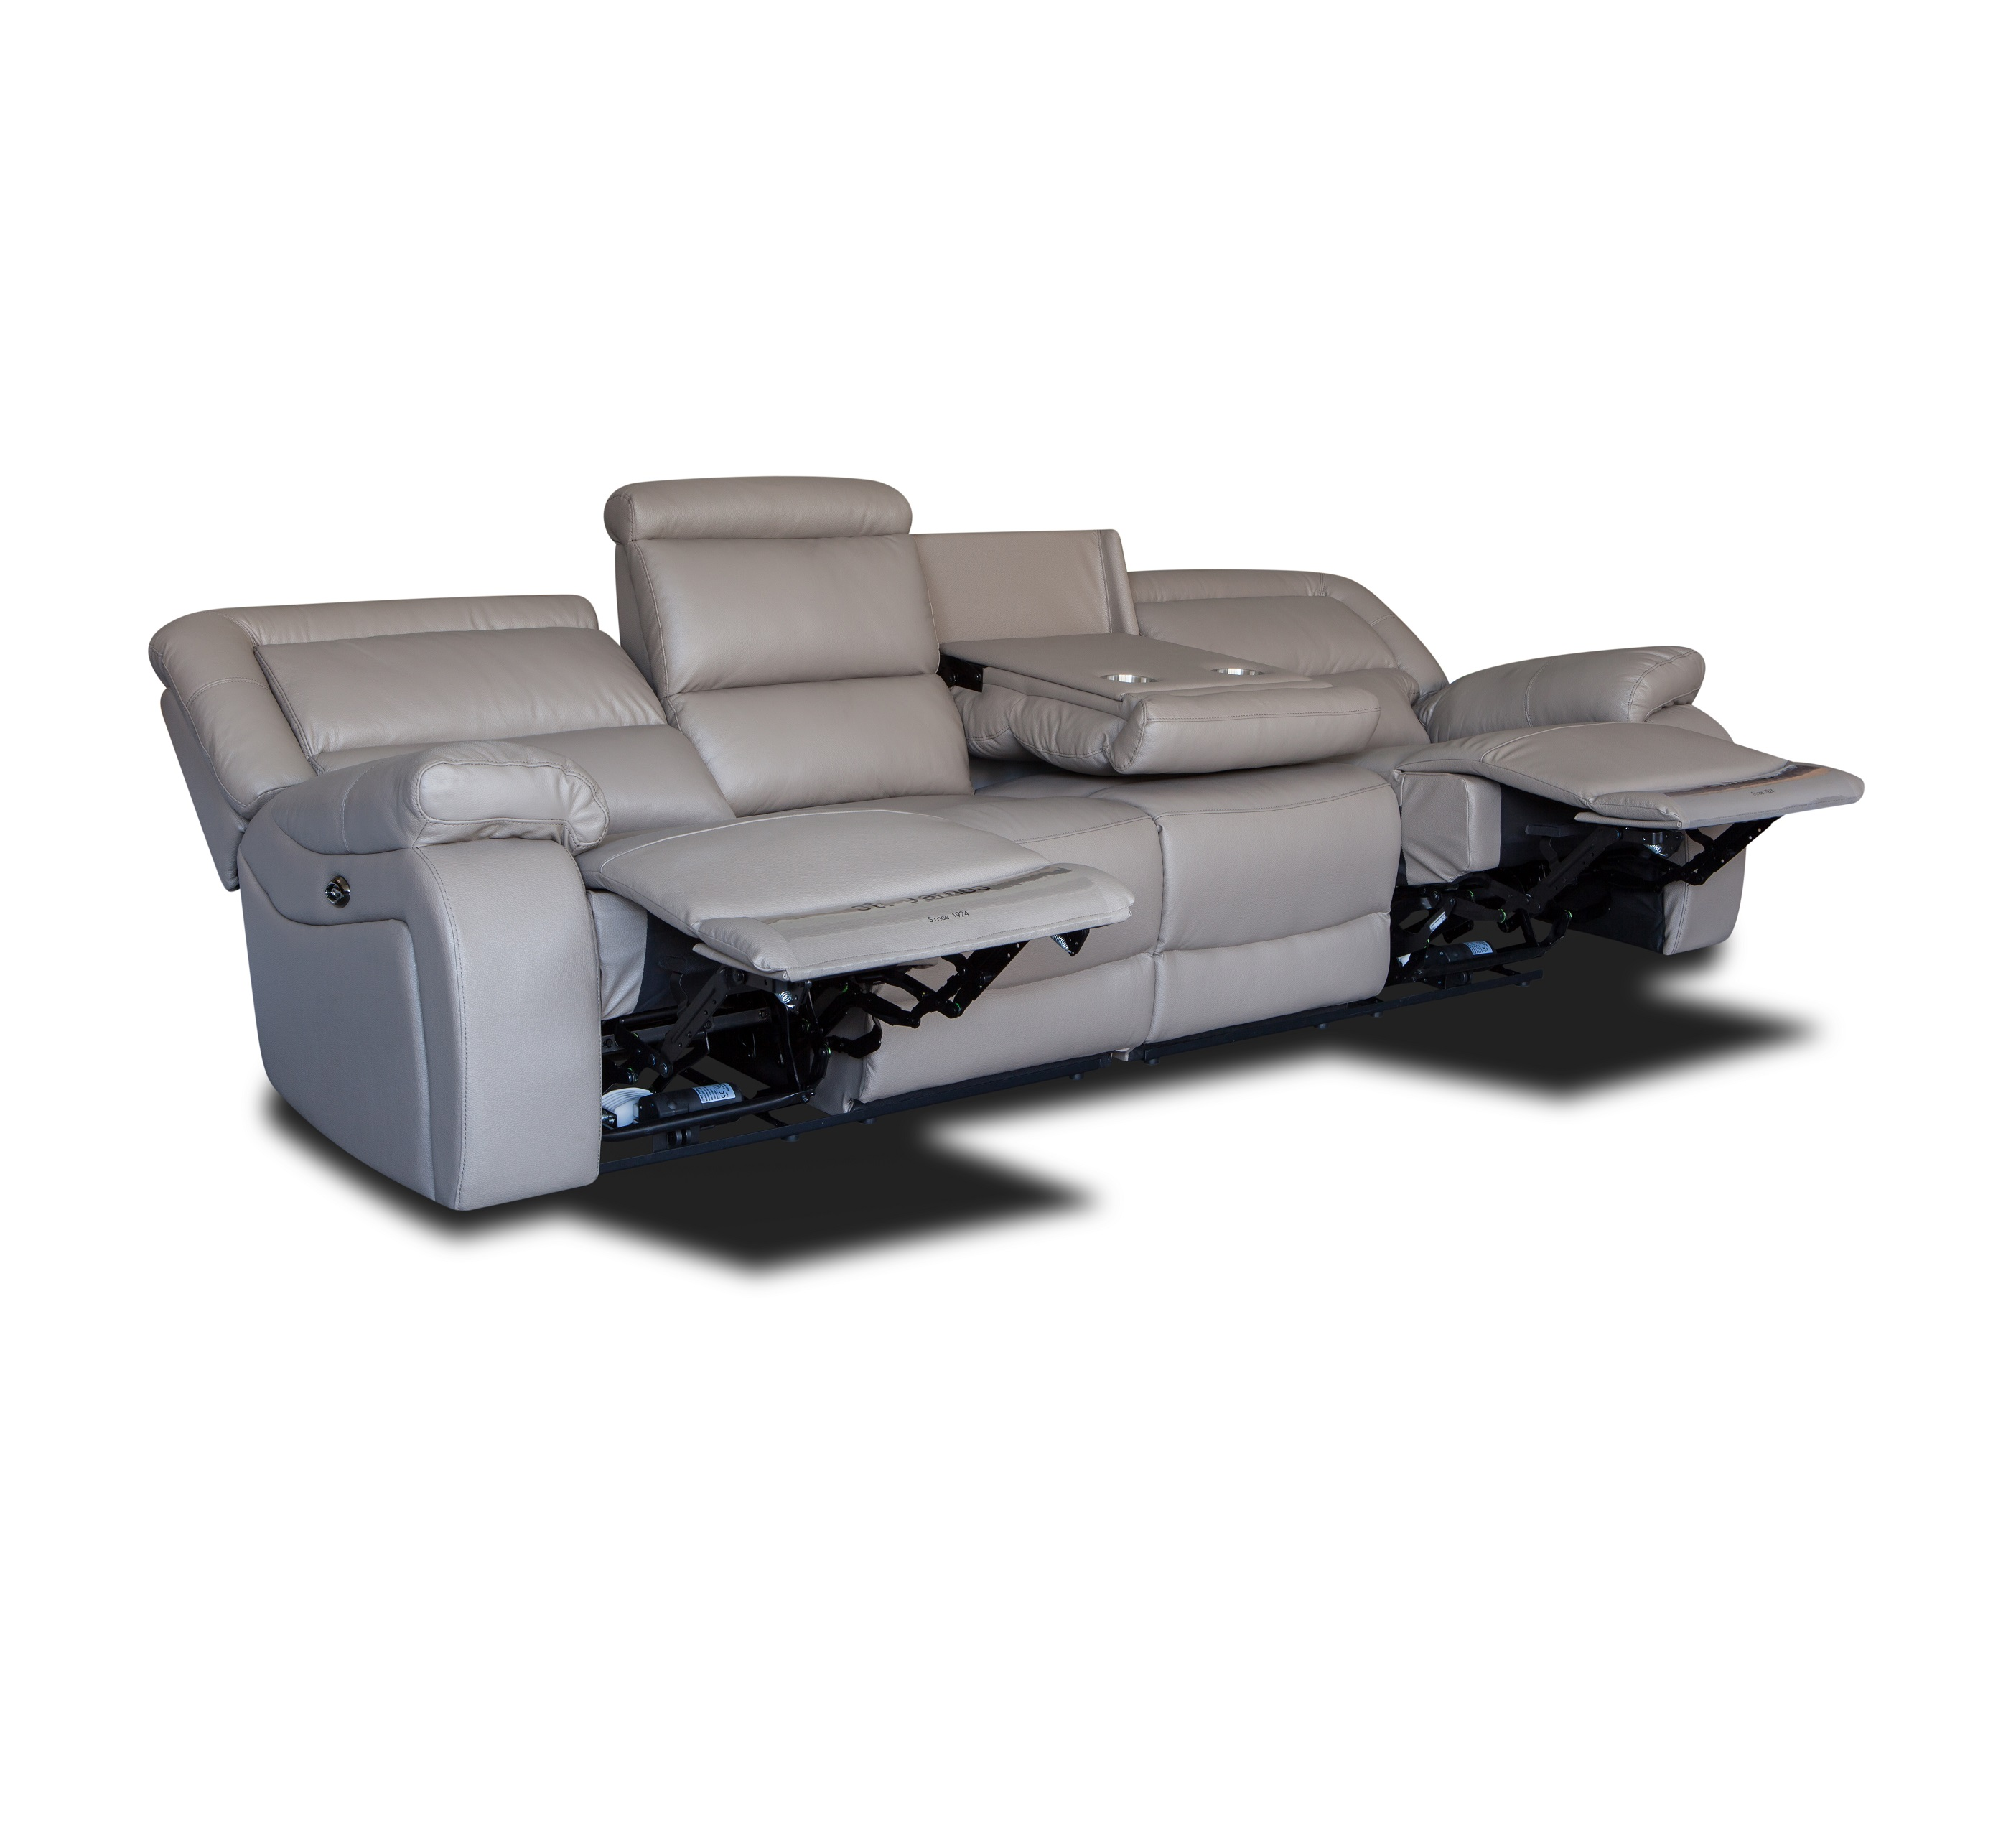 Reasonable Price Fabric Rocker Sofa